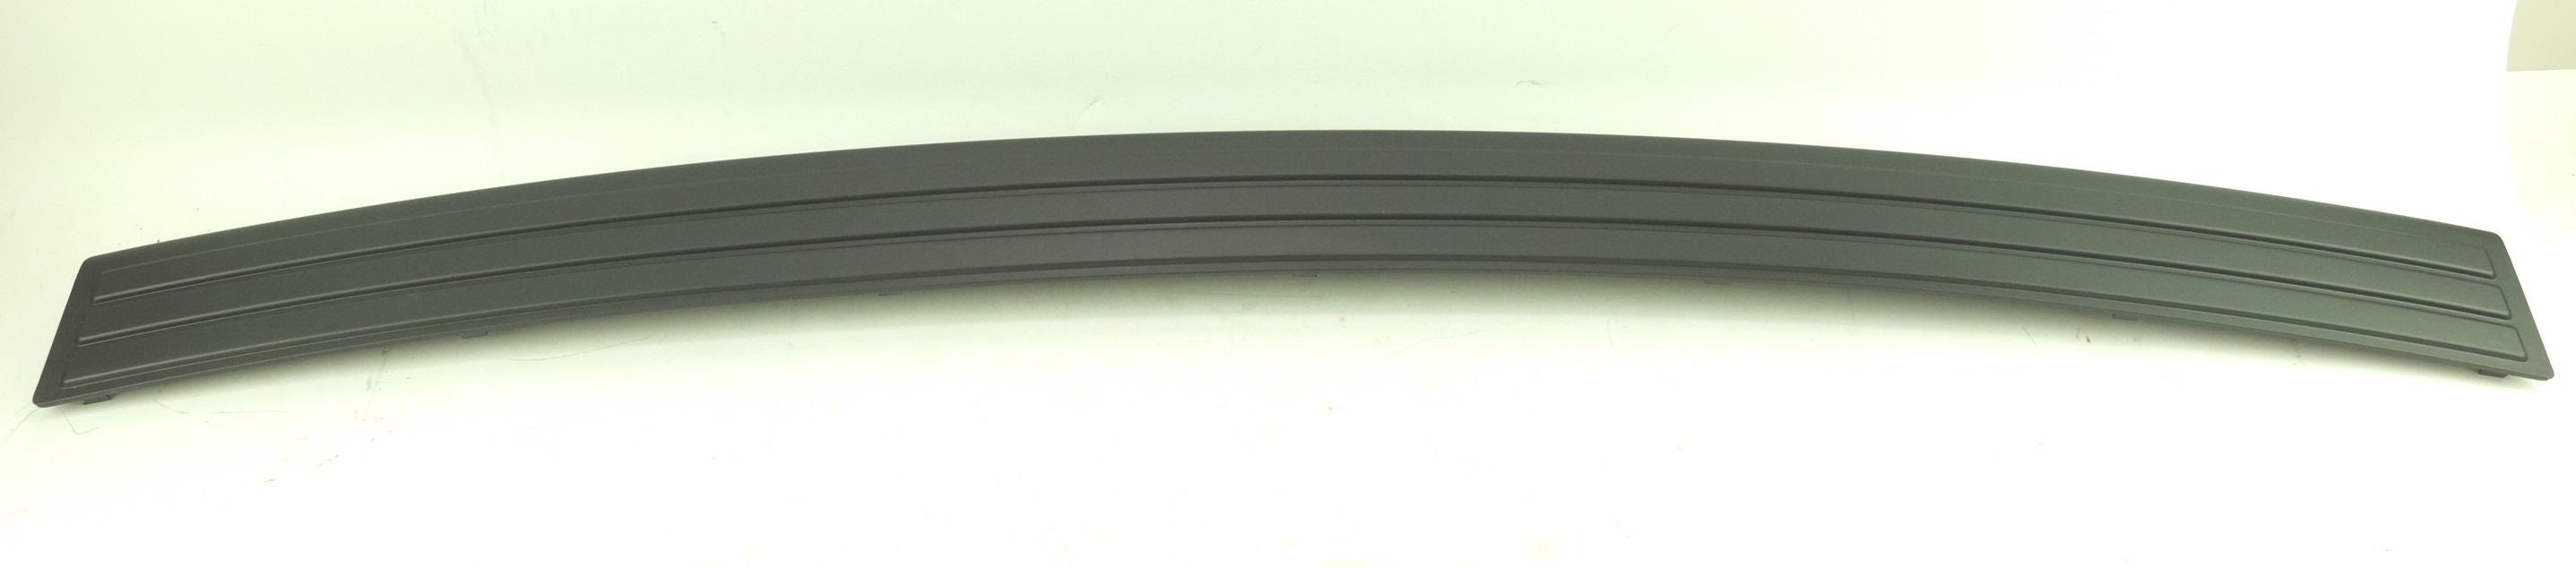 New OEM 68091515-AA Genuine Mopar Rear Fascia Bumper Step Pad Fast Free Shipping - image 1